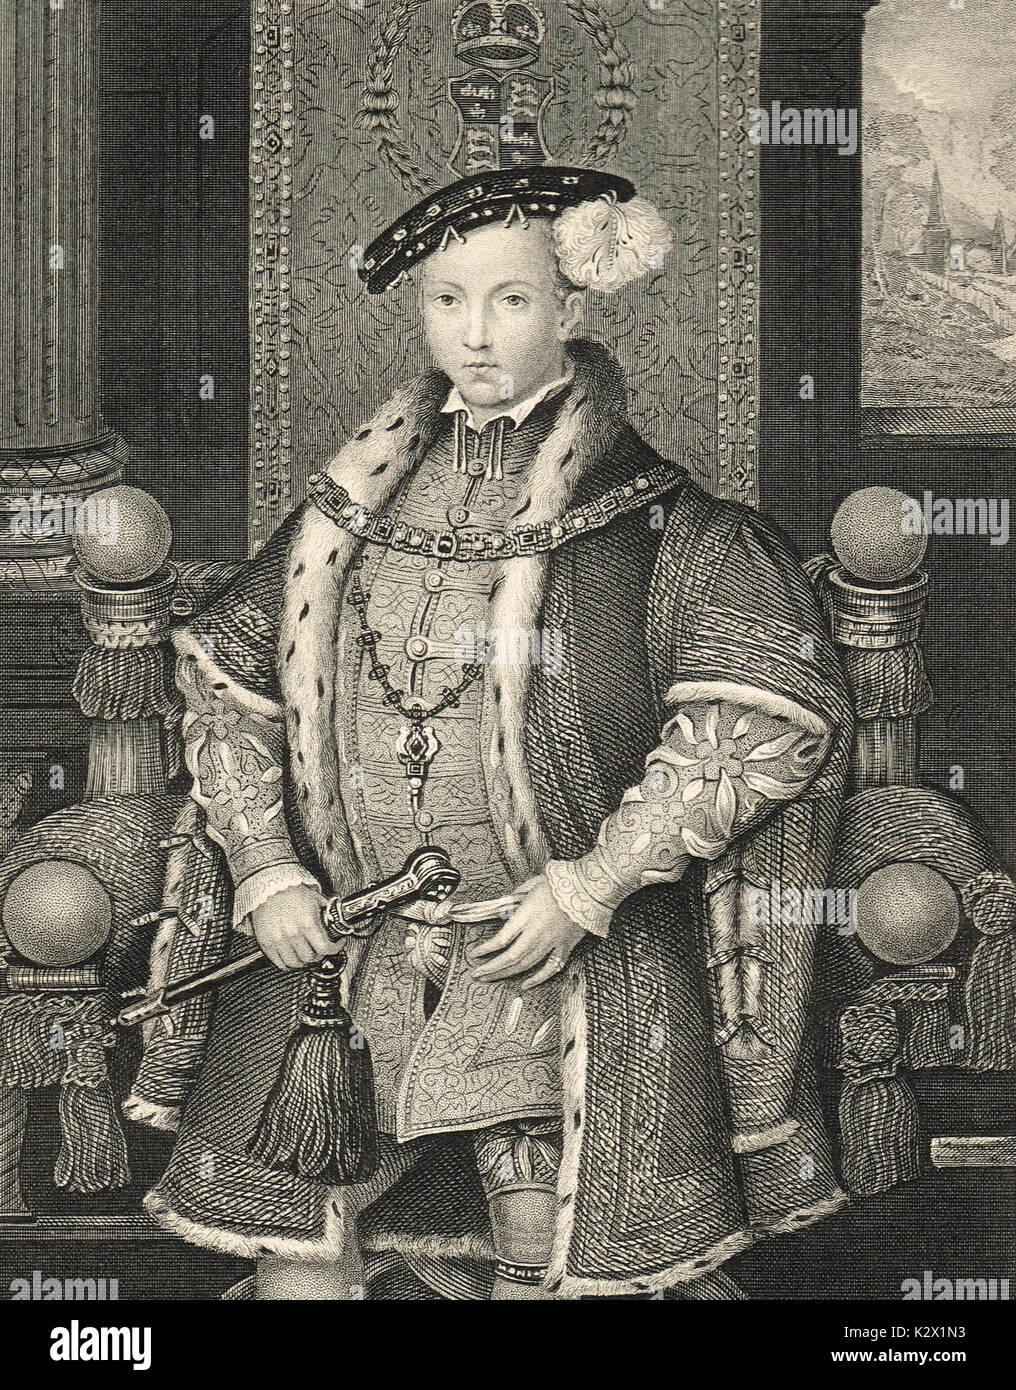 The future King Edward VI aged 6, circa 1543 - Stock Image